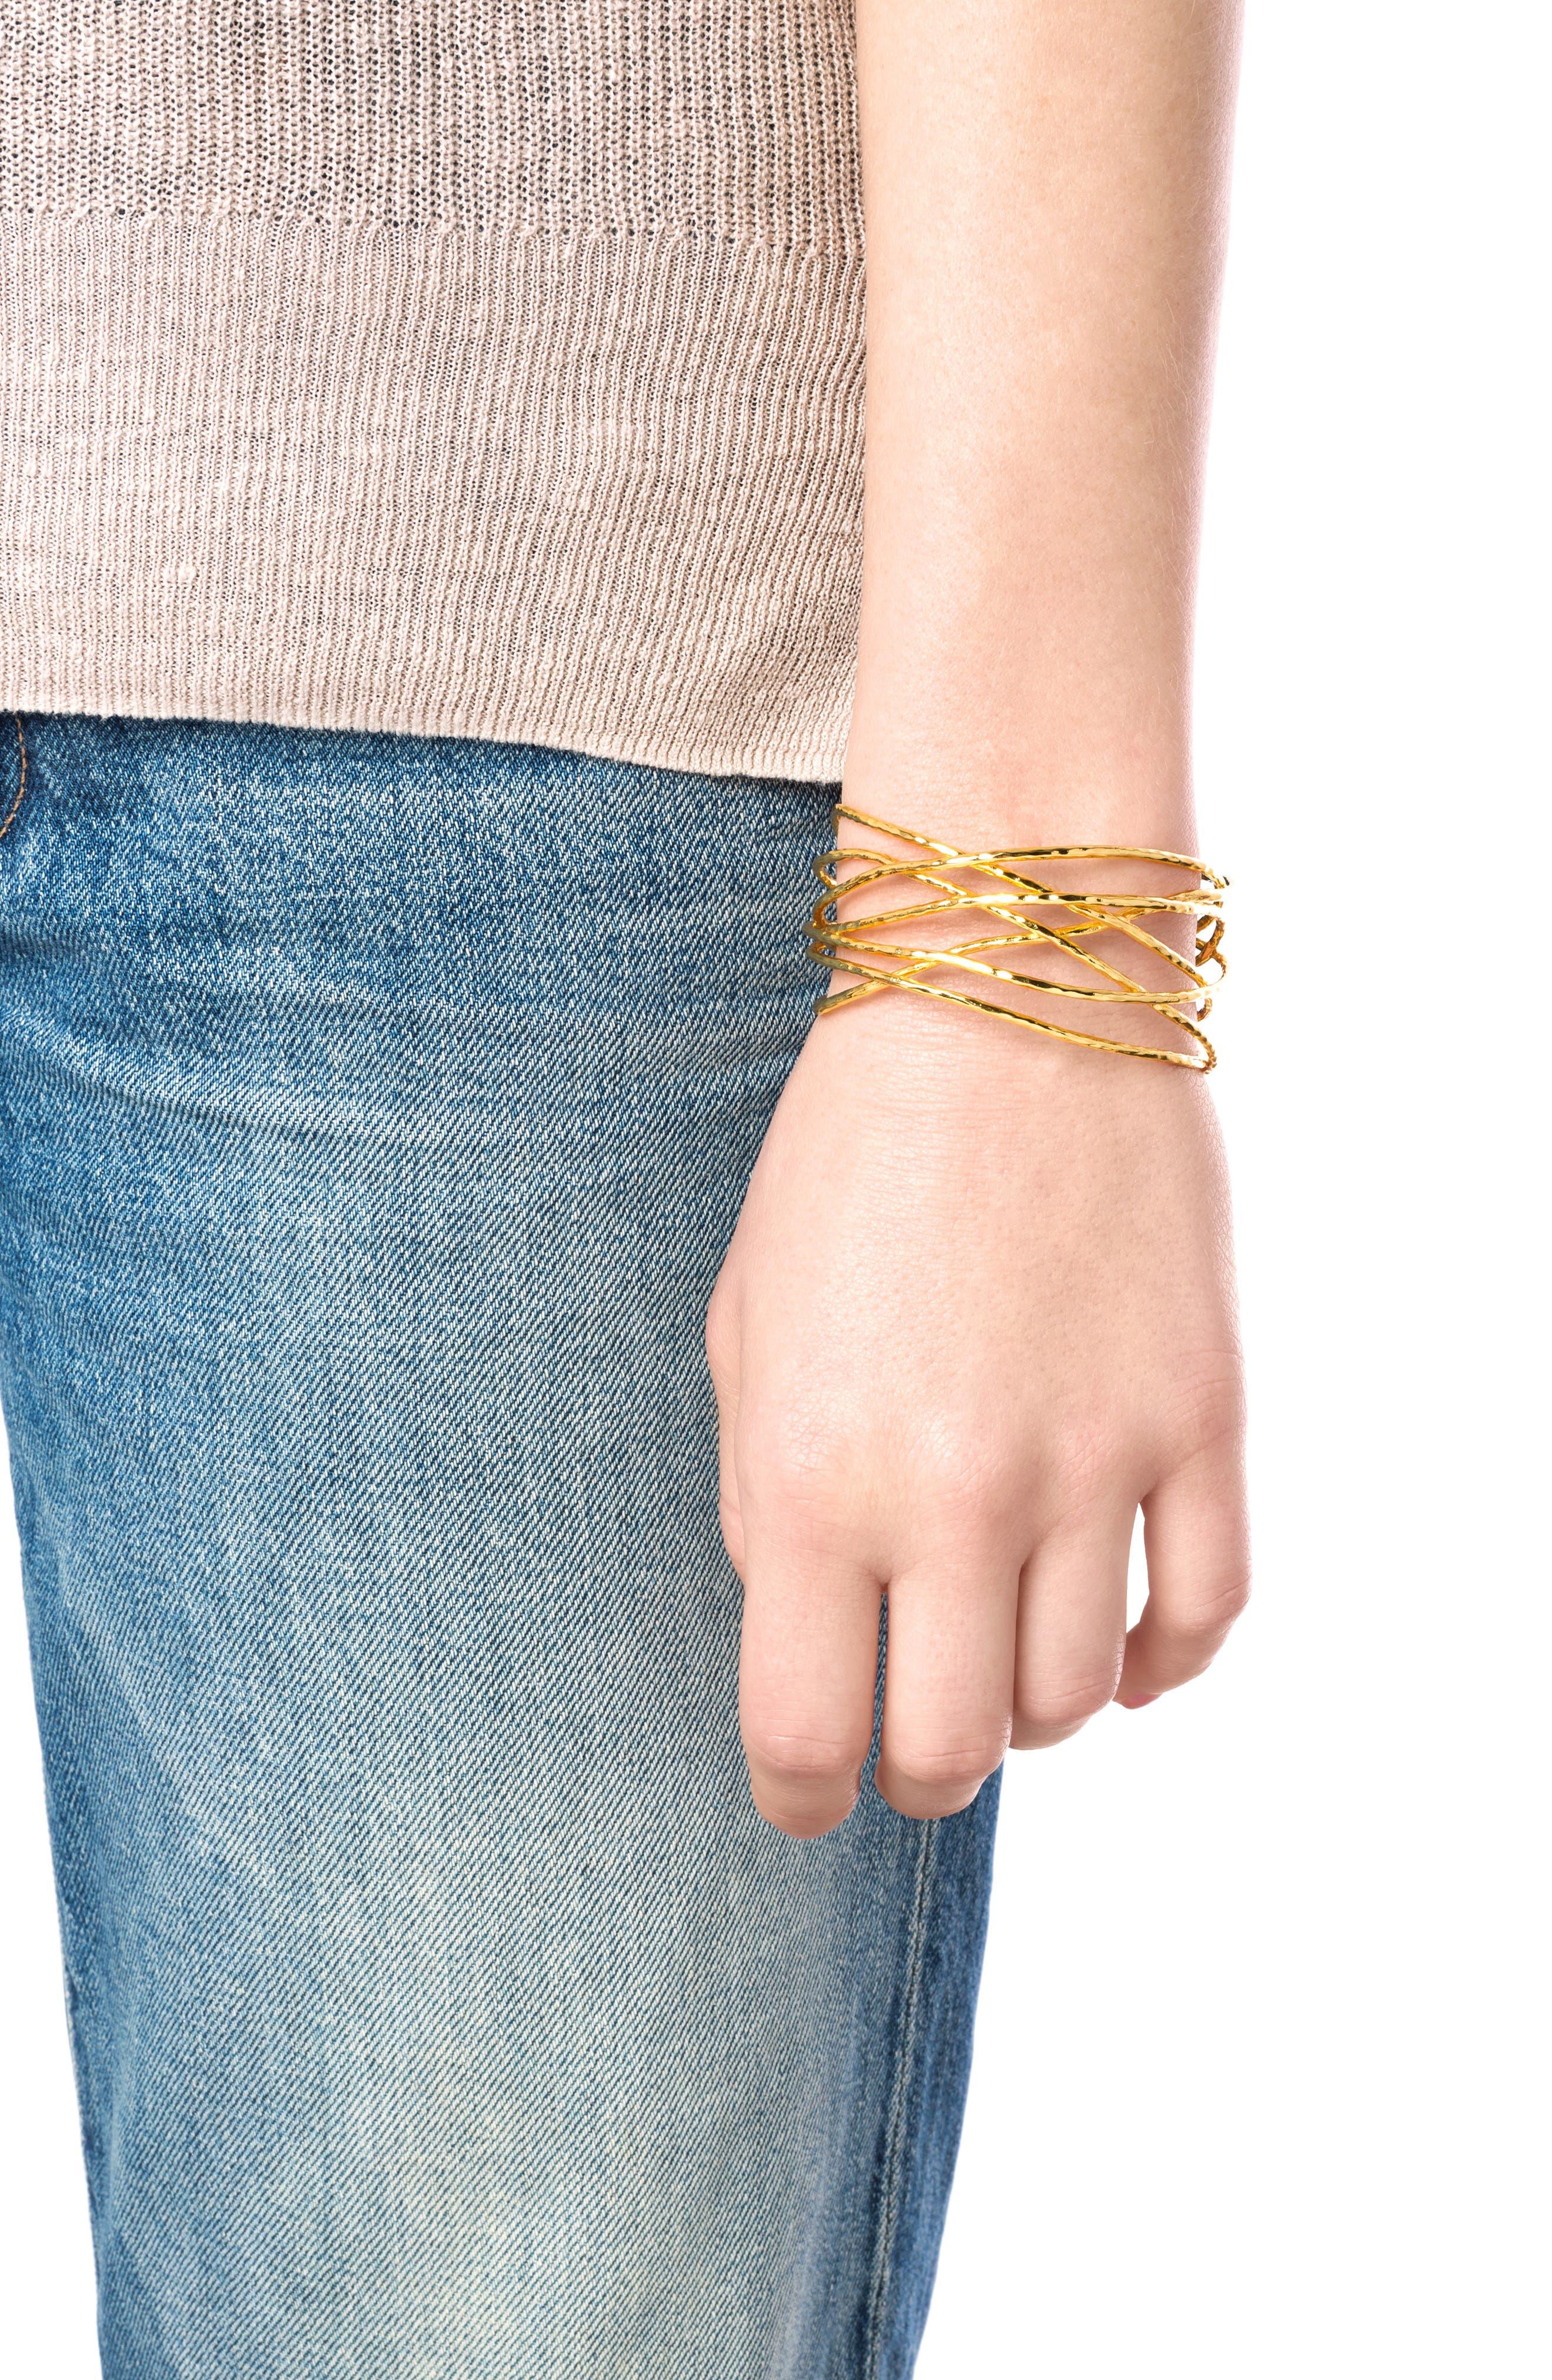 Lola Wrist Cuff,                             Alternate thumbnail 2, color,                             Rose Gold